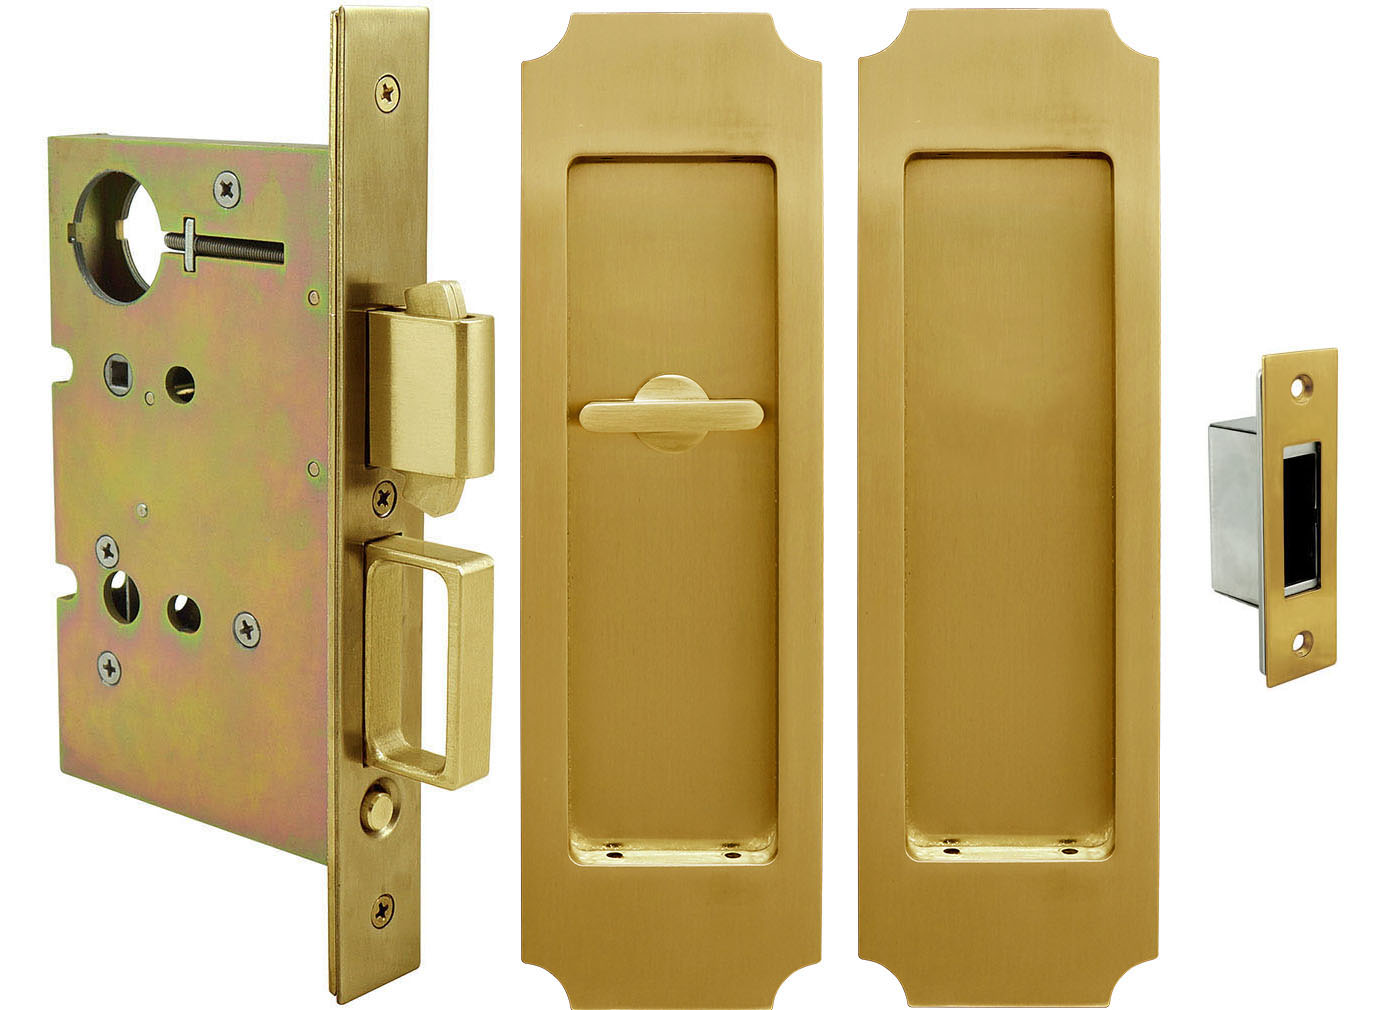 Oil Rubbed Bronze Unison Hardware Inox Pd81 234 10b Mortise Pocket Door Lock Passage With Built In Edge Pull And Dust Proof Strike Pocket Bifold Door Hardware Tools Home Improvement